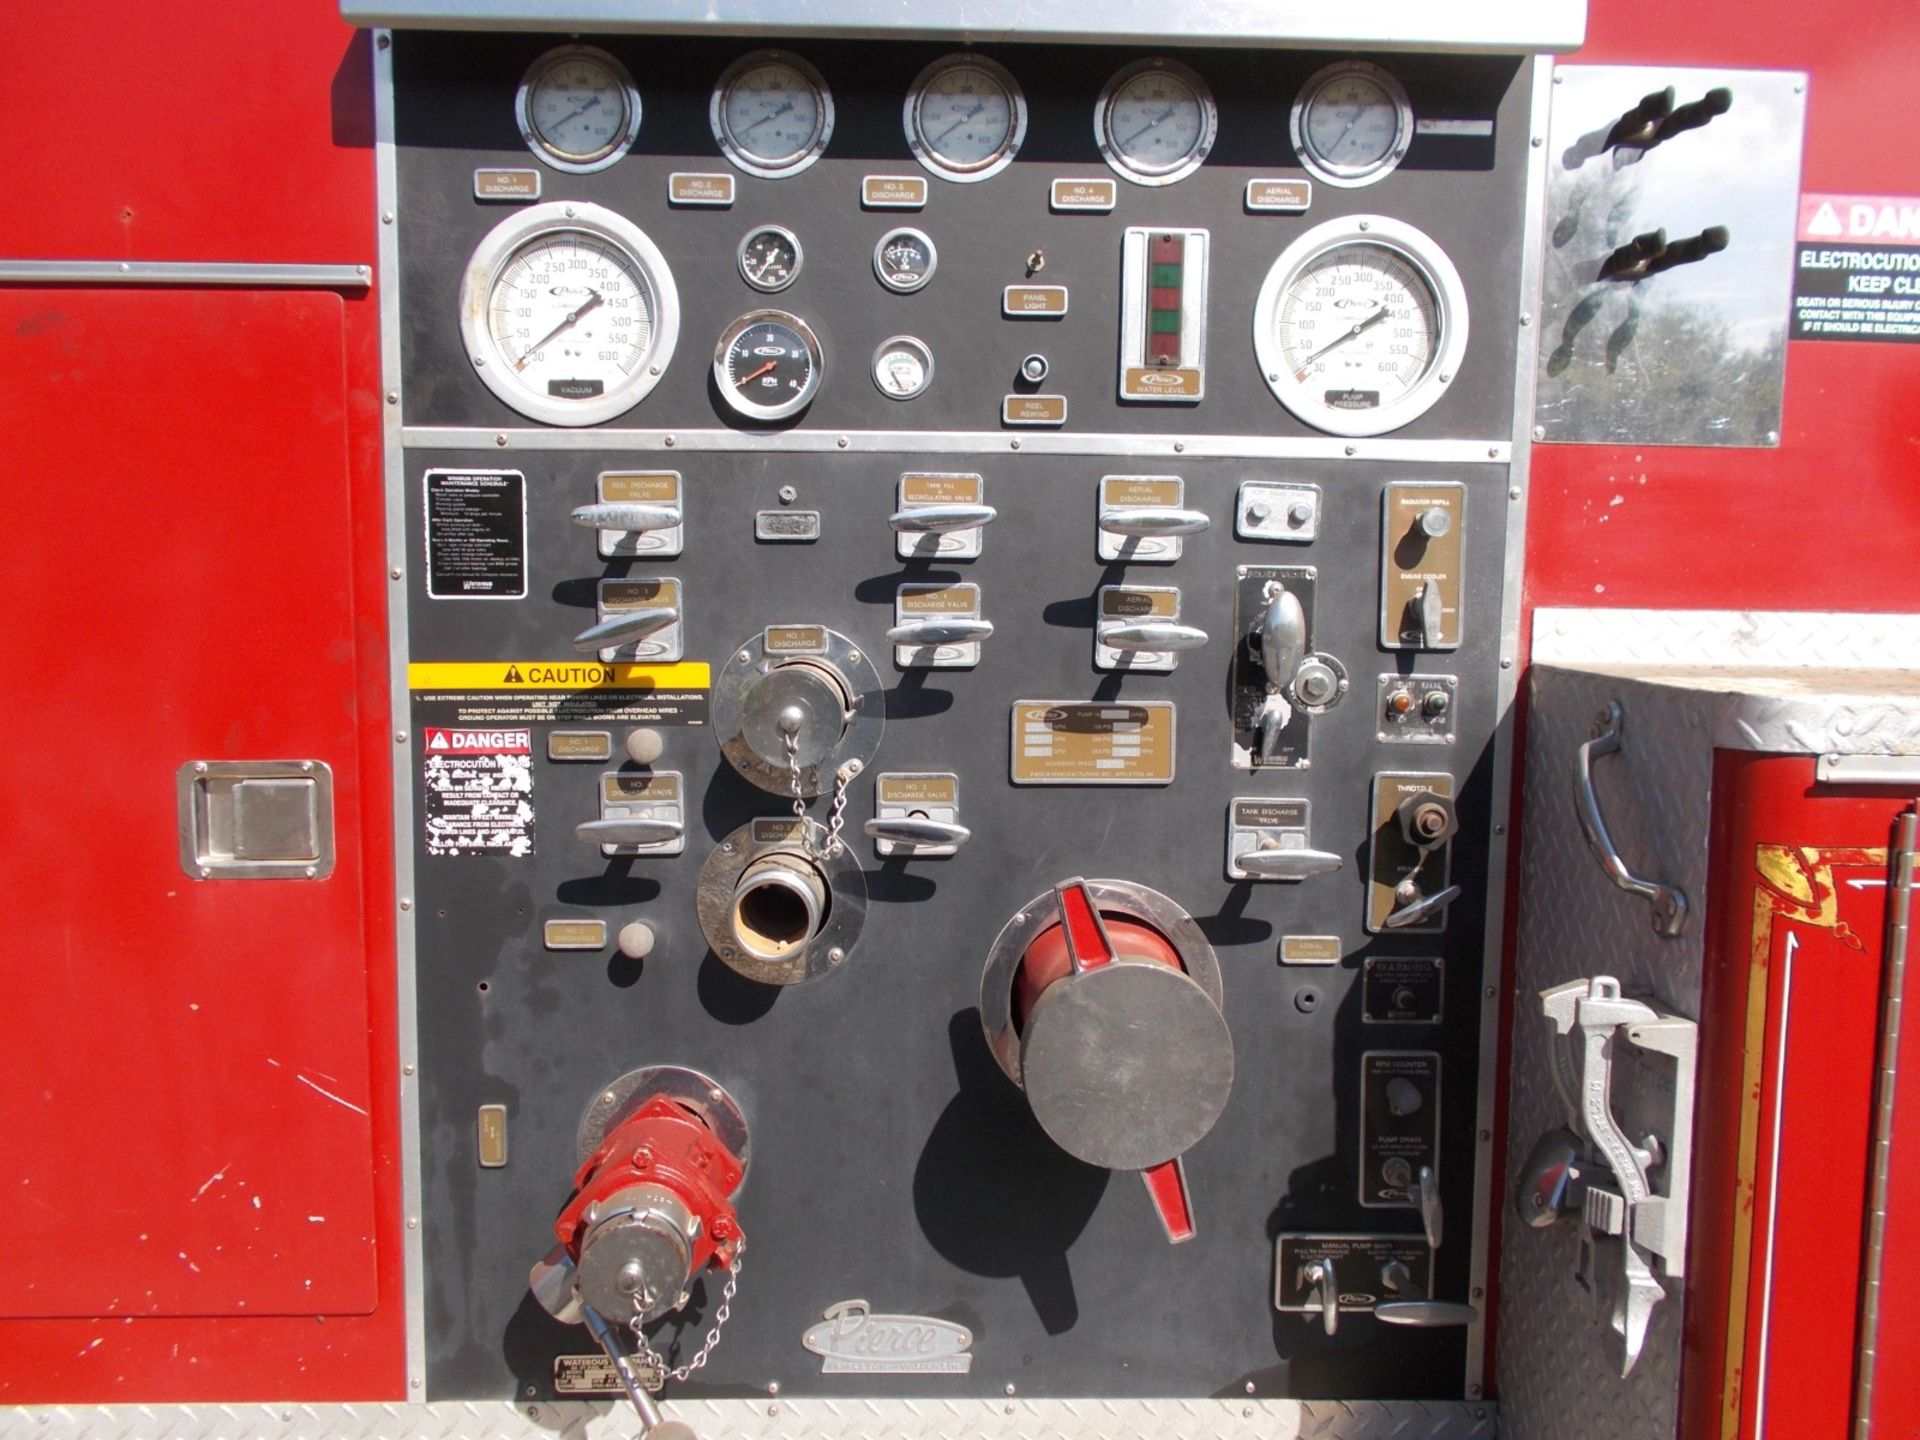 1978 HENDRICKSON 871-LPS SNORKEL FIRE TRUCK, U.S. IMPORT, 7.0 LITRE DETROIT DIESEL ENGINE *PLUS VAT* - Image 15 of 22